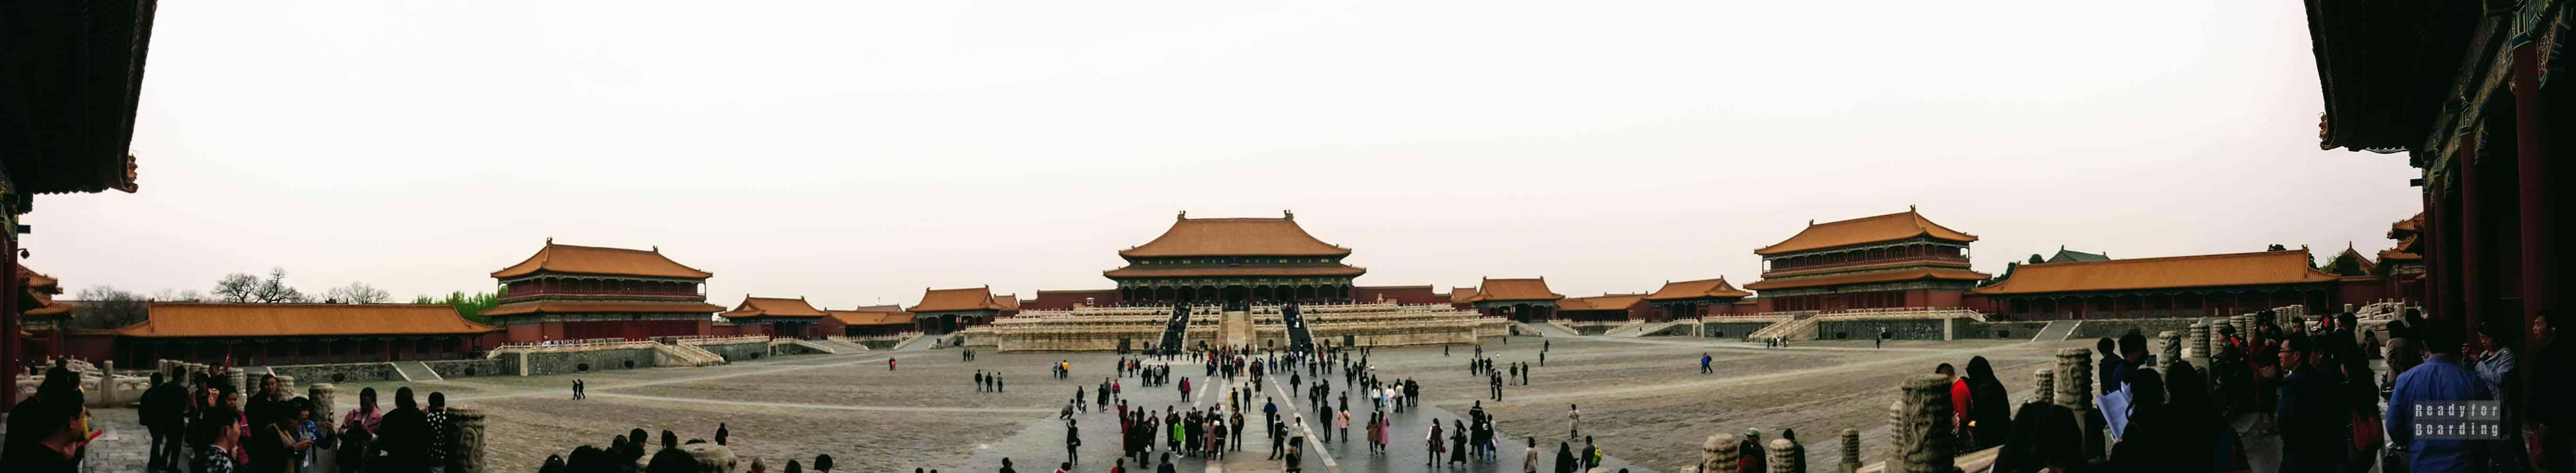 Panorama: Zakazane Miasto, Pekin